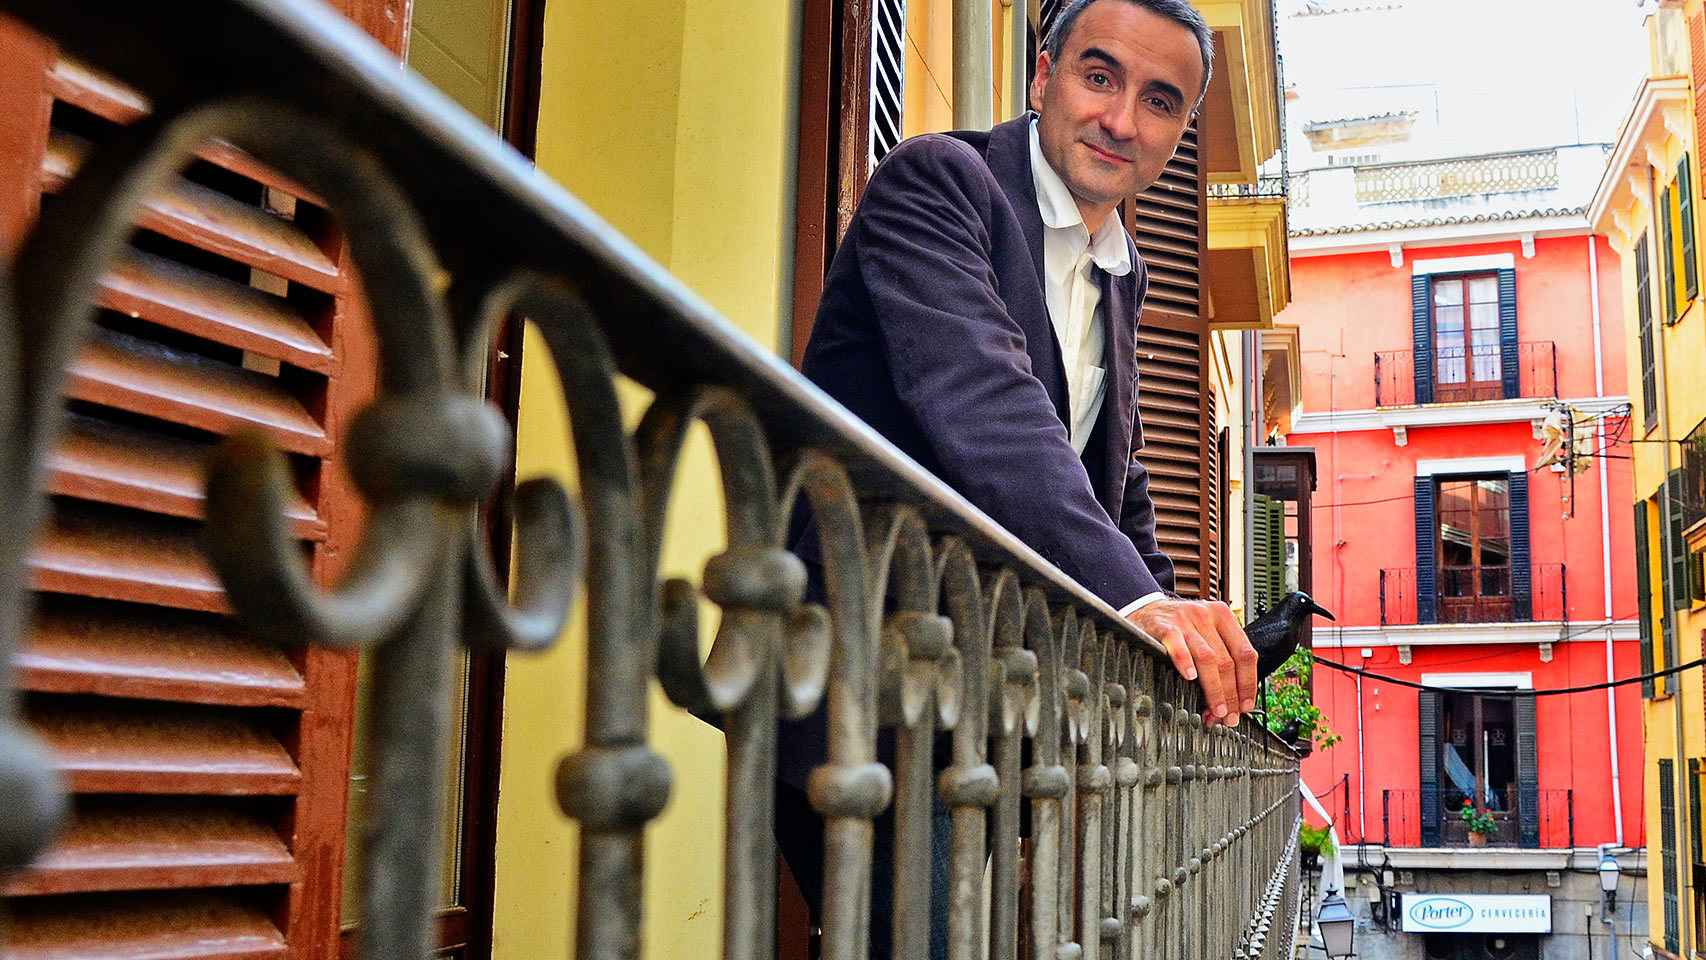 El diputado balear Pere Joan Pons, en Palma esta semana.